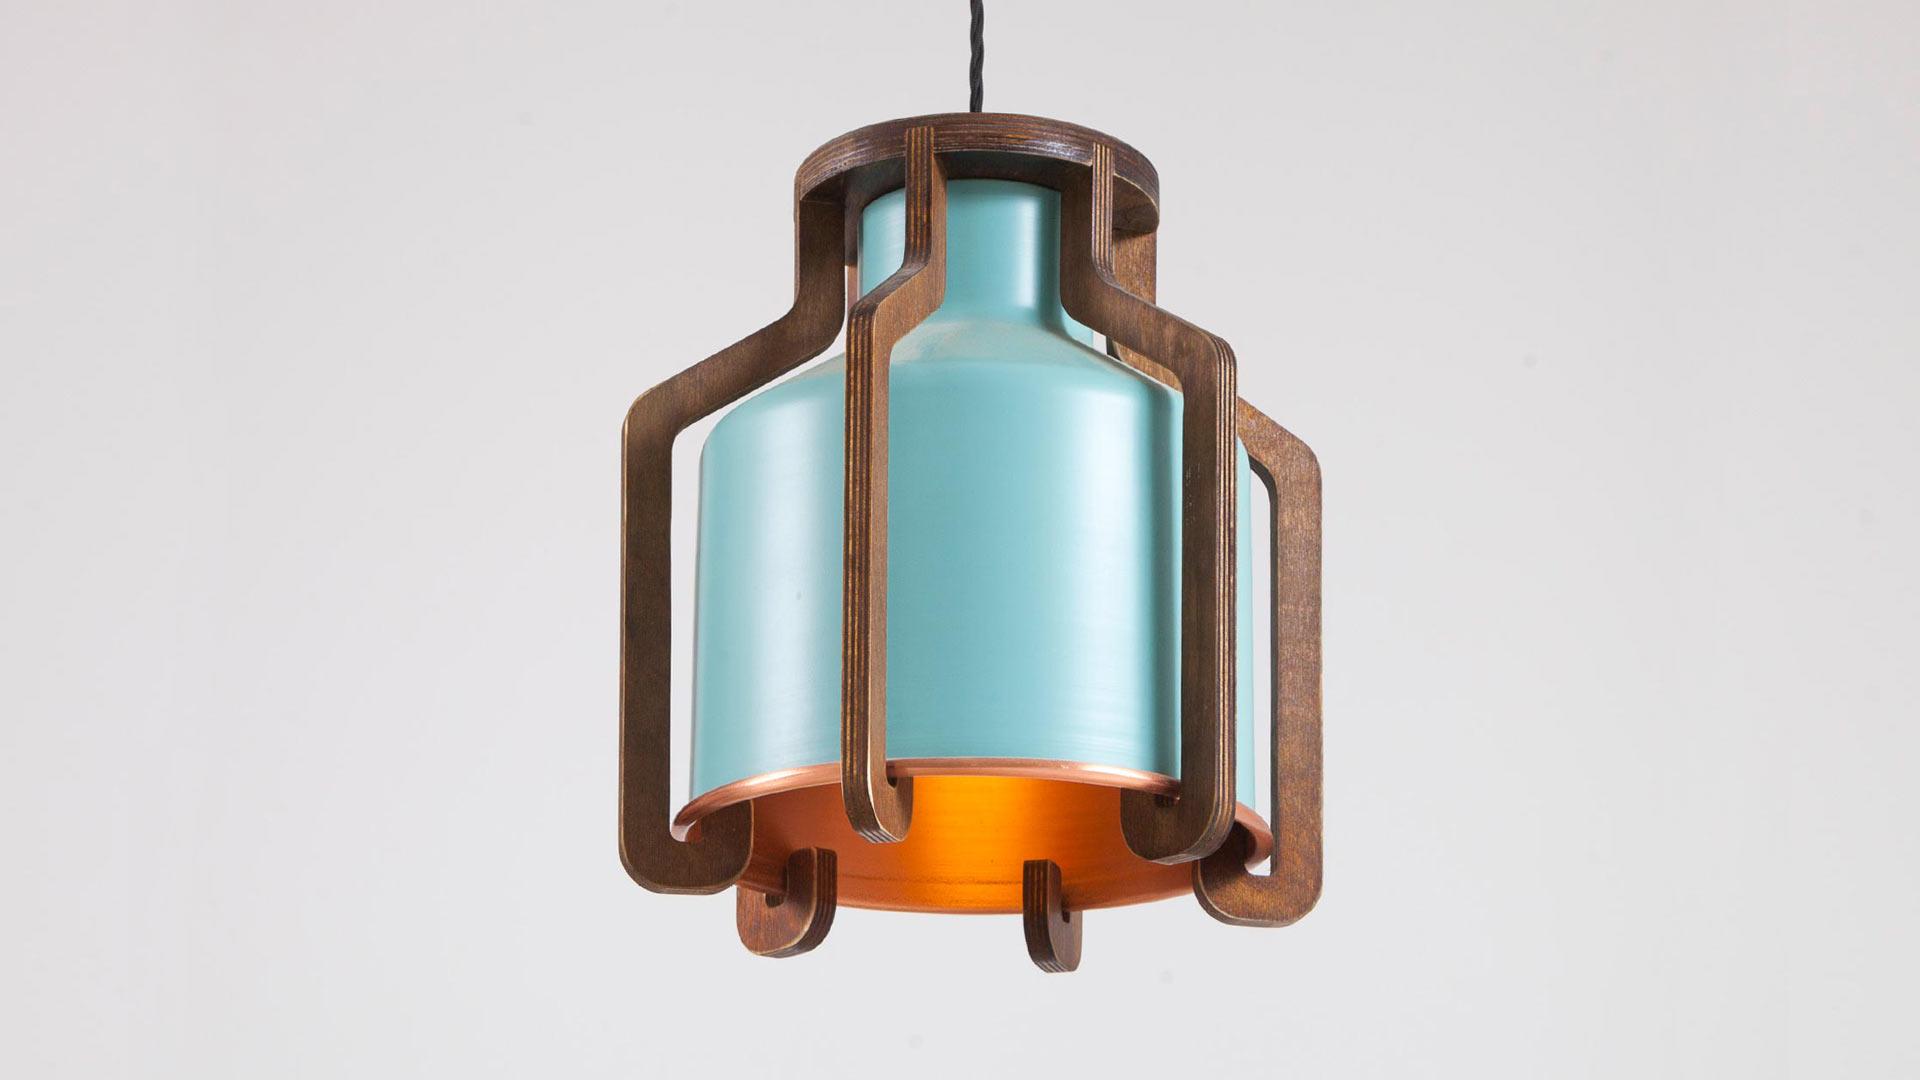 Pendant Lamp Large Ceiling Lights Ceiling Pendant Light - Individual pendant lights